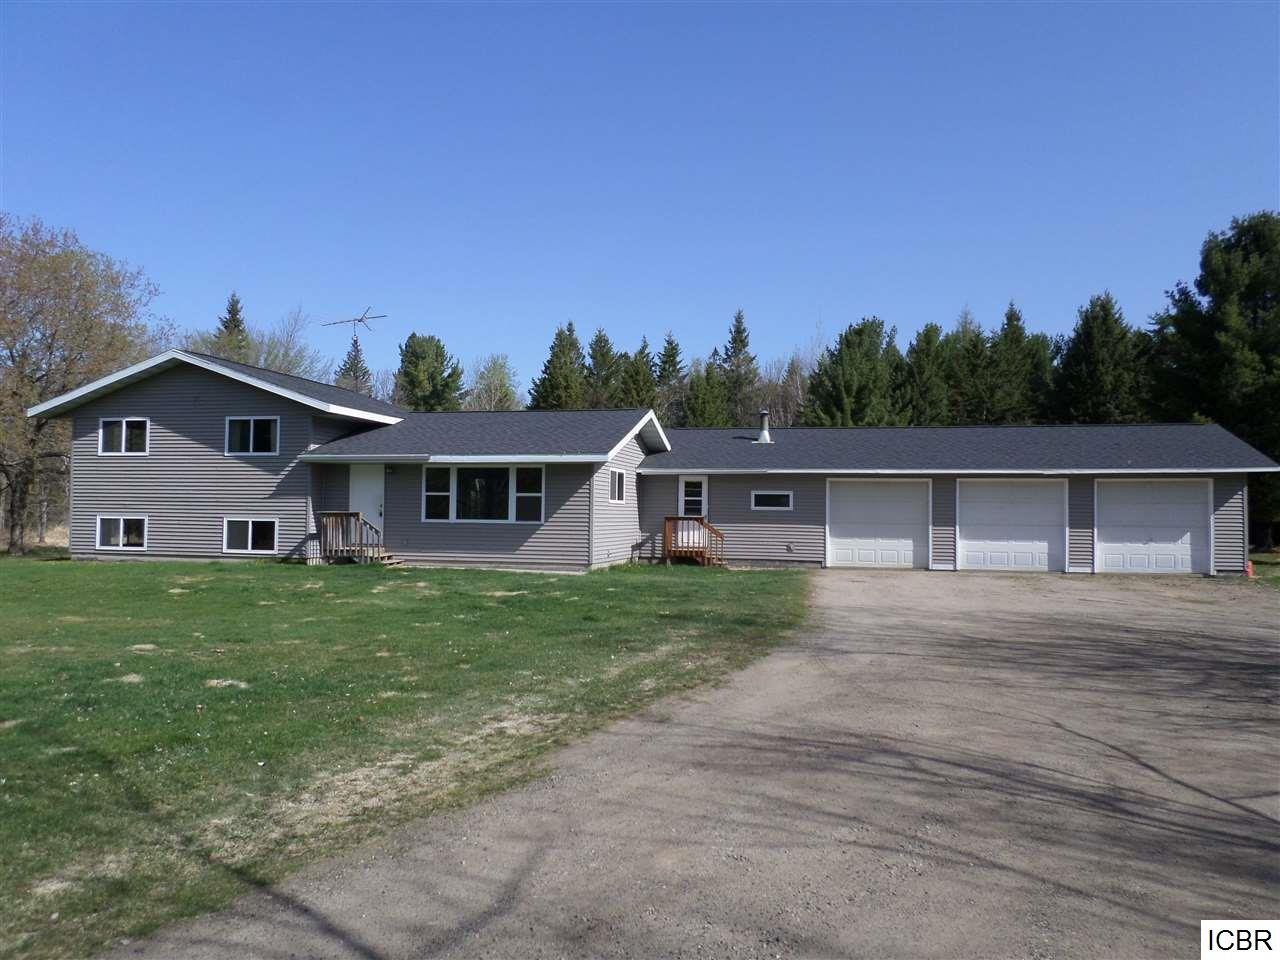 451 Trout Lake Rd, Grand Rapids, MN 55744